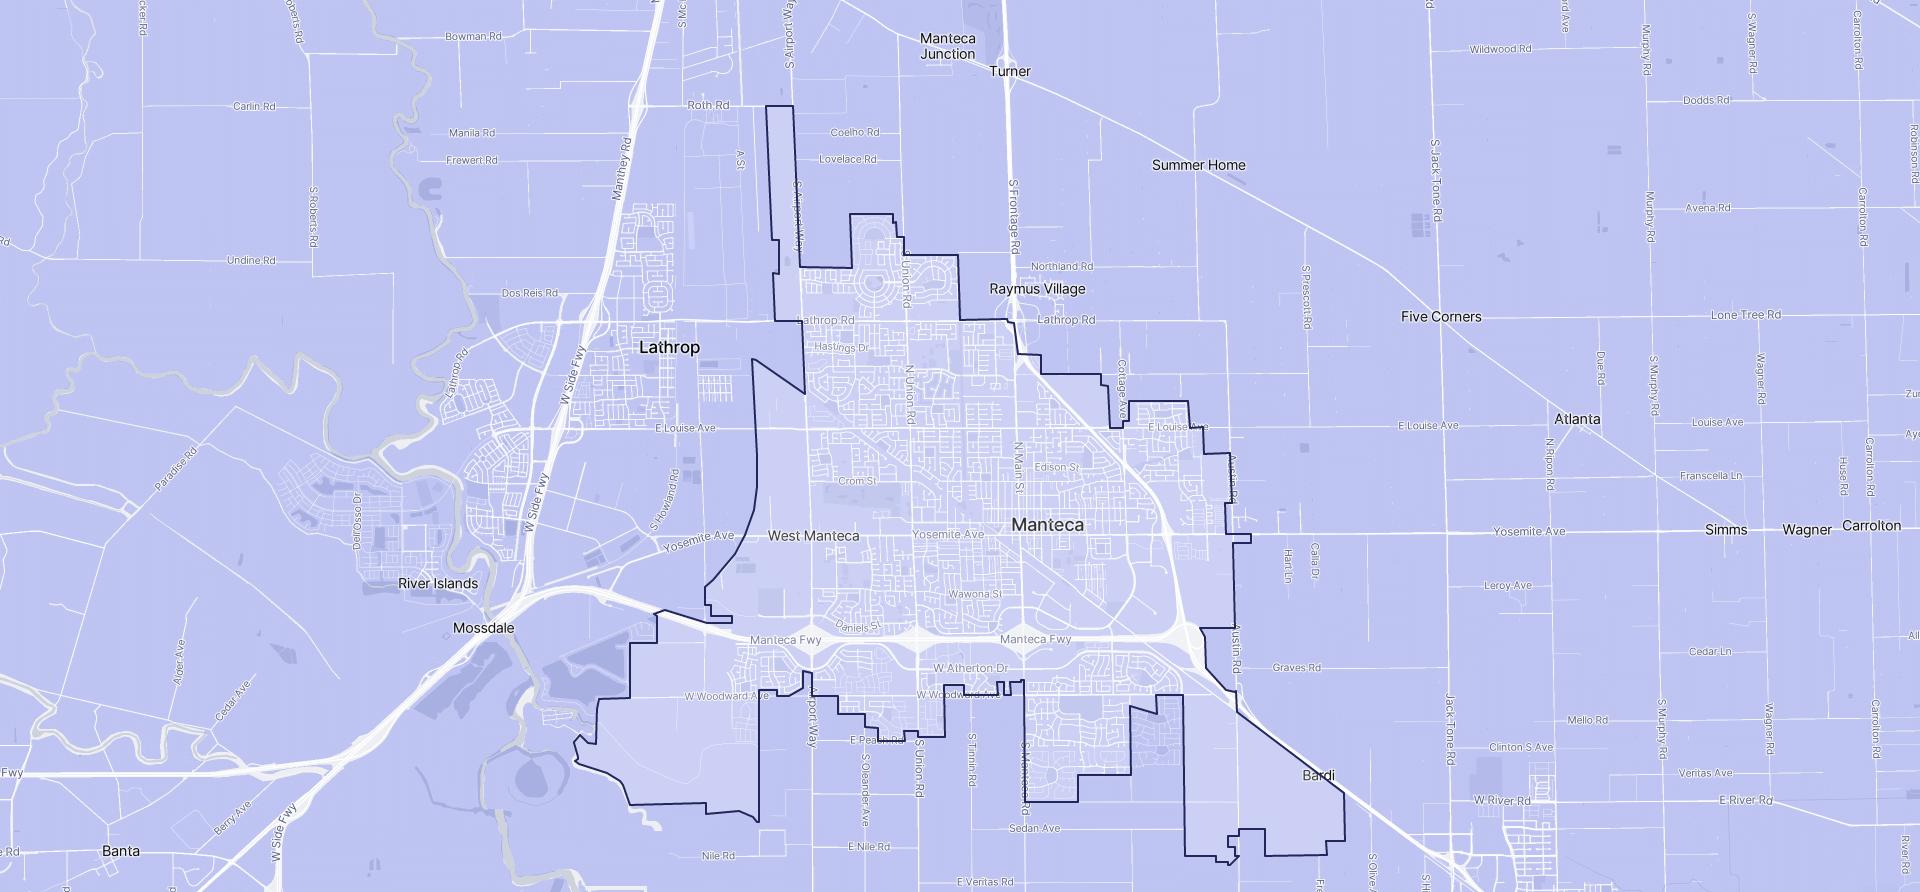 Image of Manteca boundaries on a map.